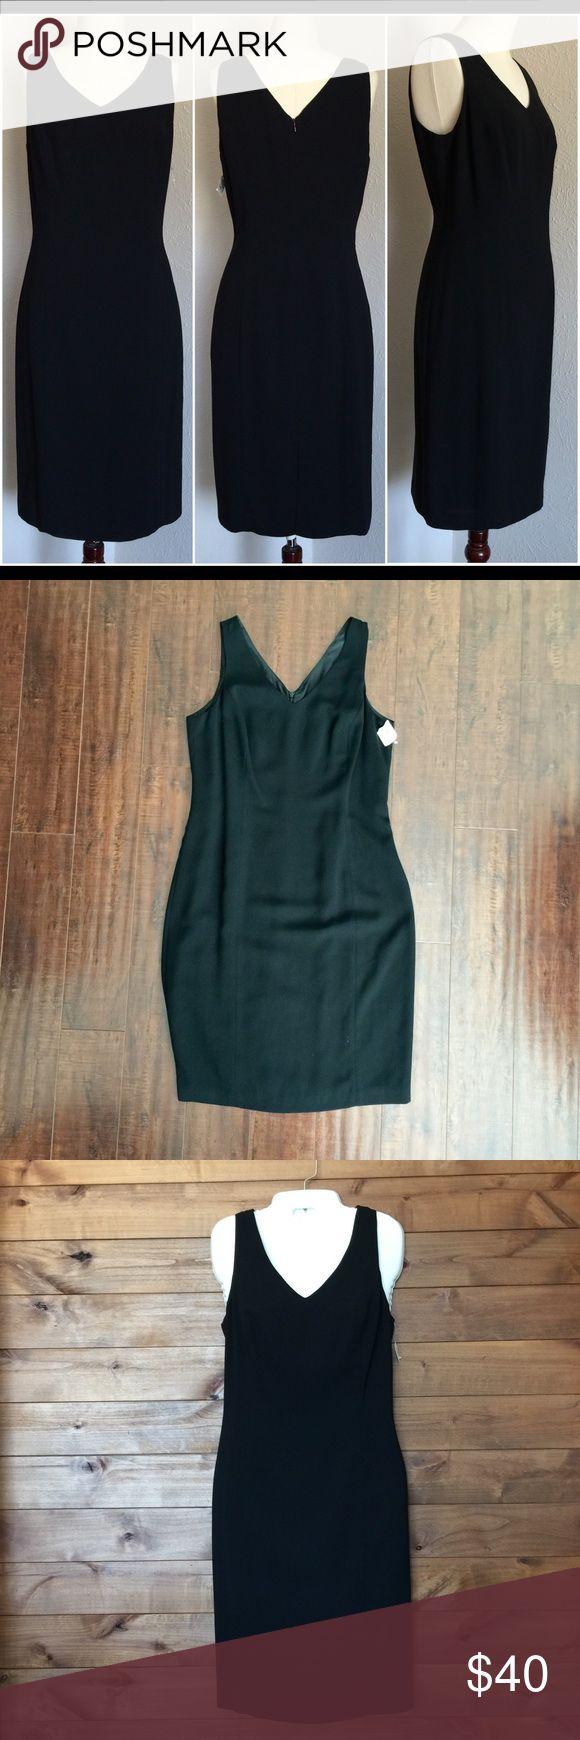 Black dress neiman marcus - Nwt Neiman Marcus Isabel Ardee Black Sheath Dress Neiman Marcus Isabel Ardee Black Sheath Dress